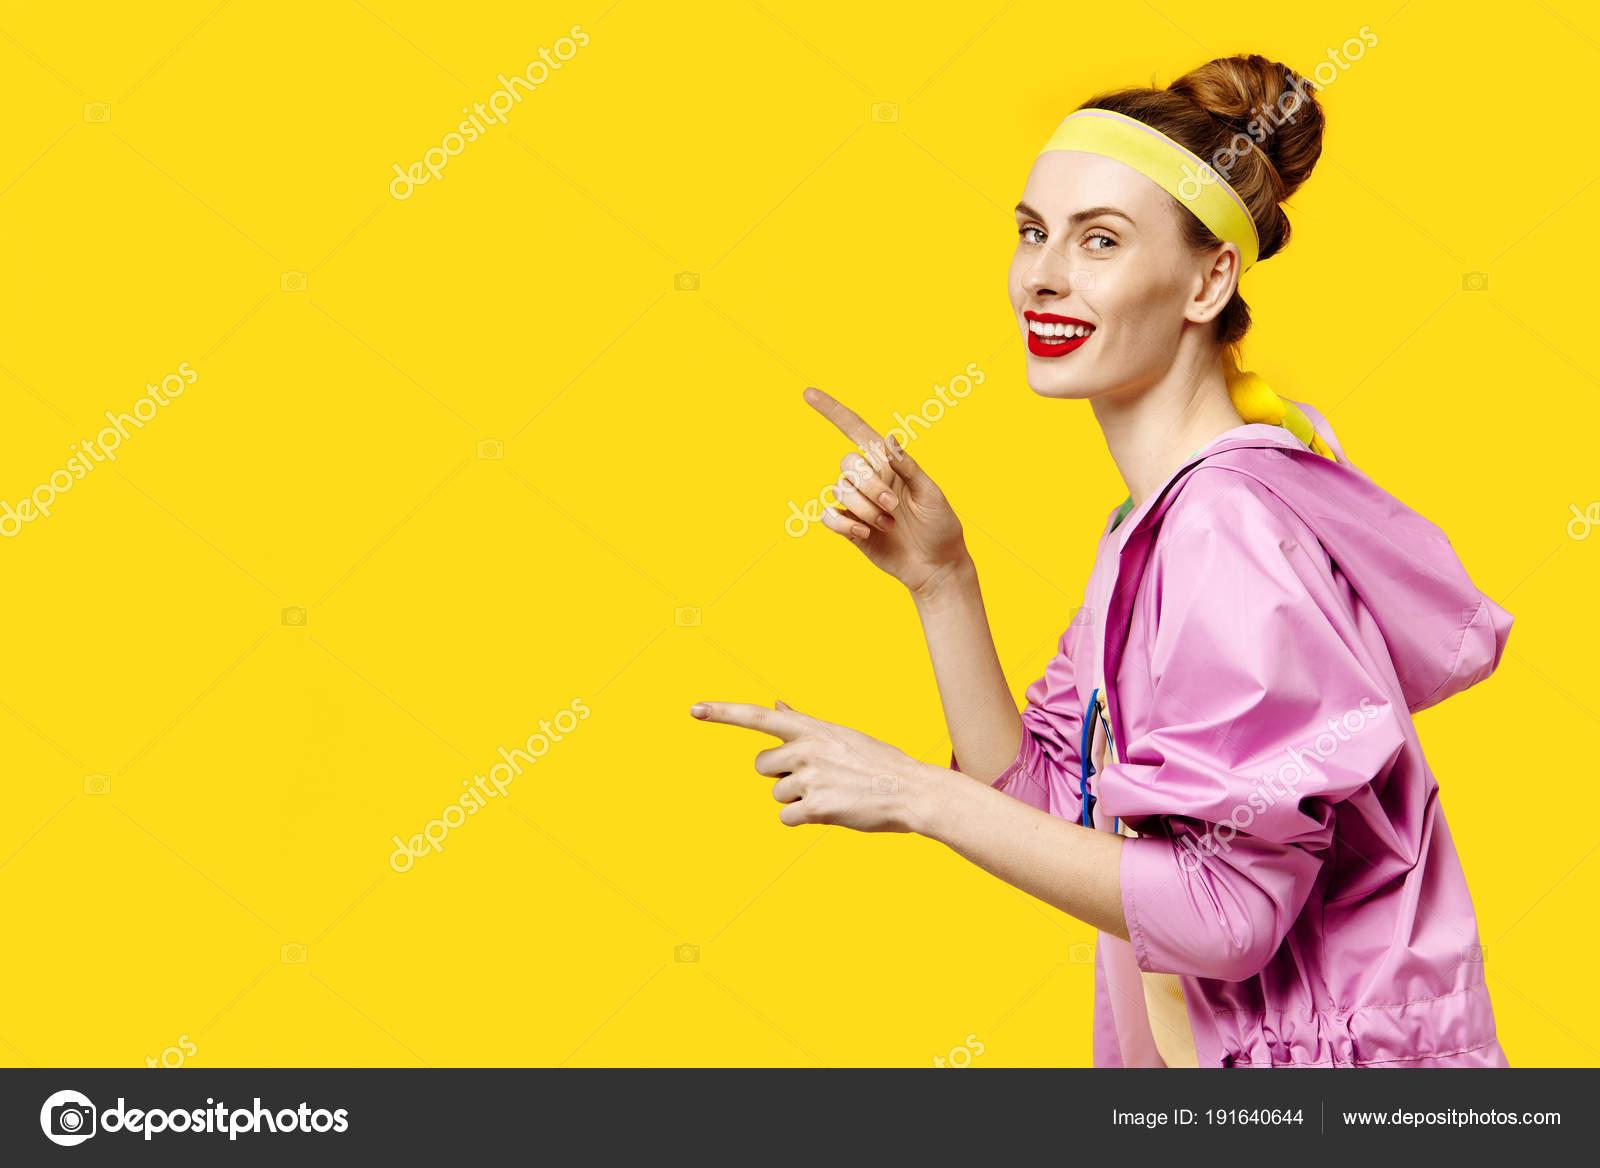 35872775f16 Mladá žena na žlutém pozadí a růžový kabát. Barevný koncept posedlost.  Minimalistický styl. Stylové Trendy– stock obrázky